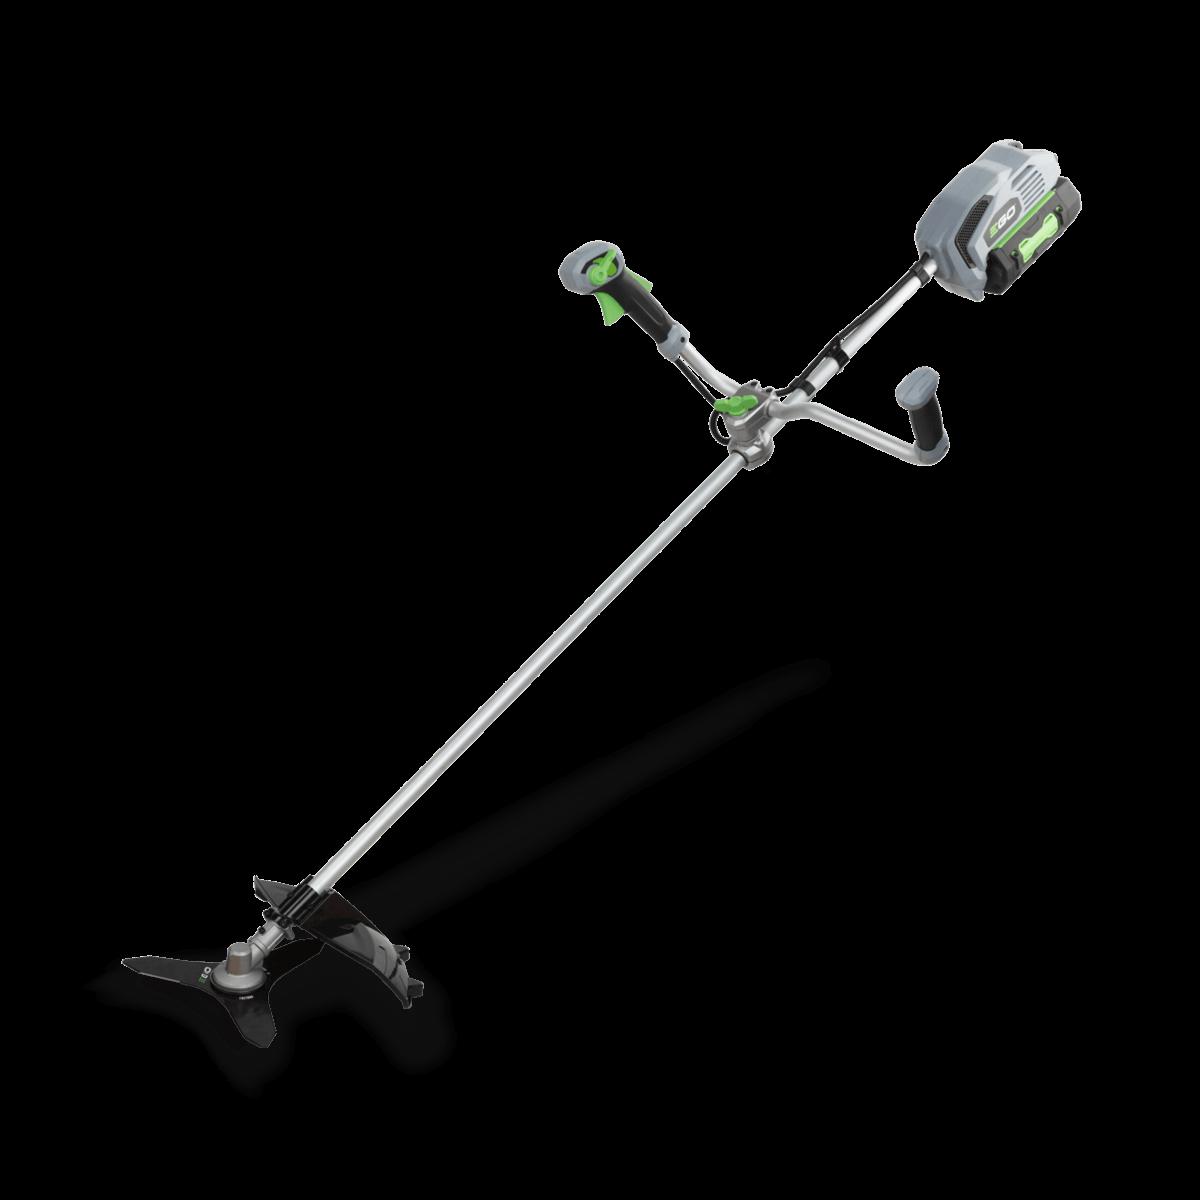 power-38cm-motorna-kosa-rapid-u-rocaj-motor-zadaj